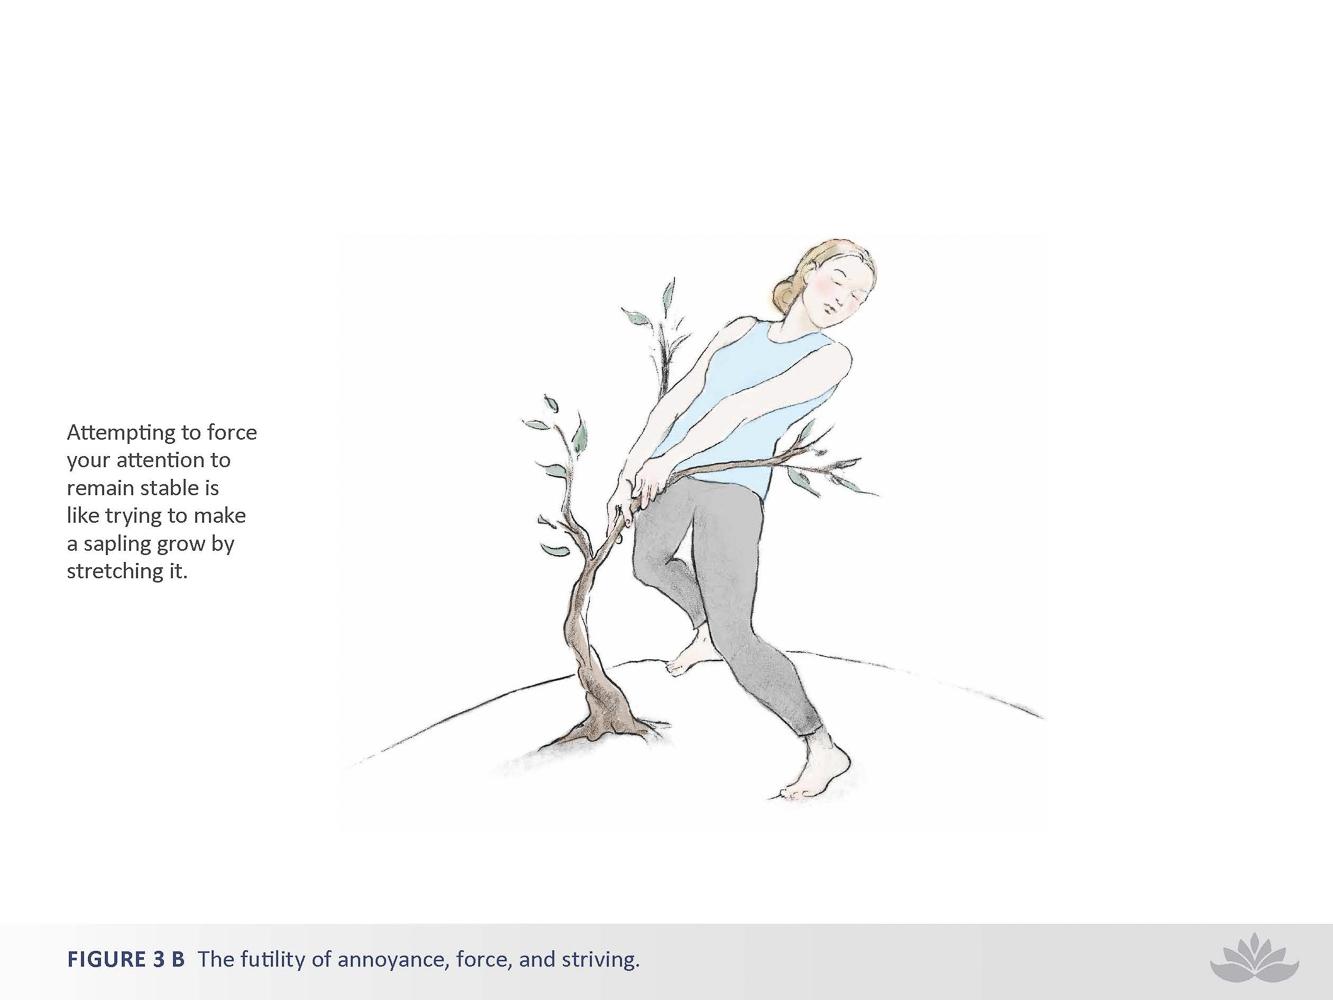 nwd-illustration-33-2.jpg